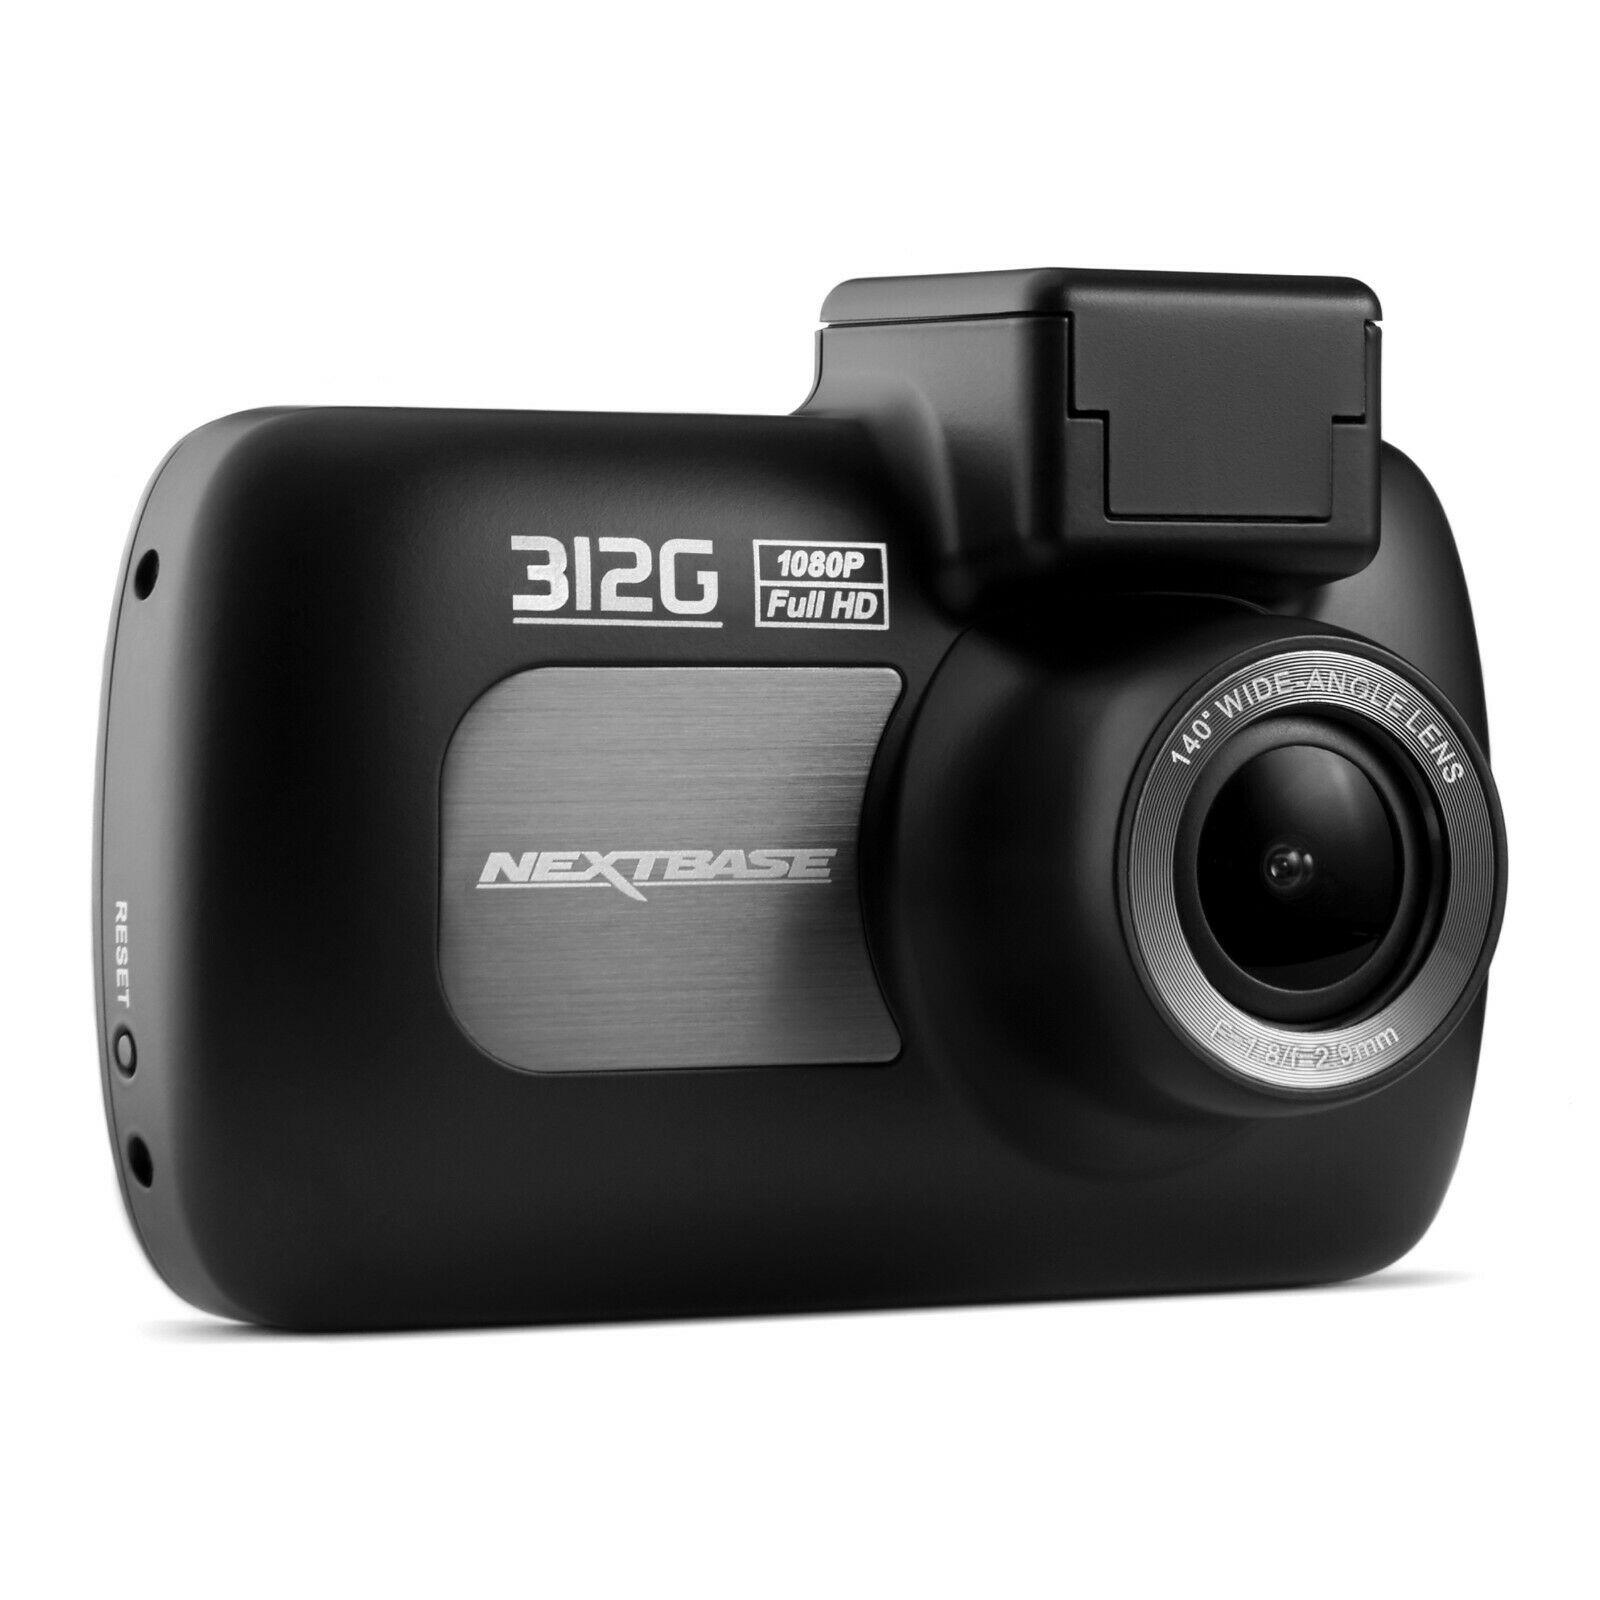 "Nextbase 312G Dash Cam 1080P 2.7"" LED Car Recorder Night Vision £59.95 @ velocityelectronics eBay"